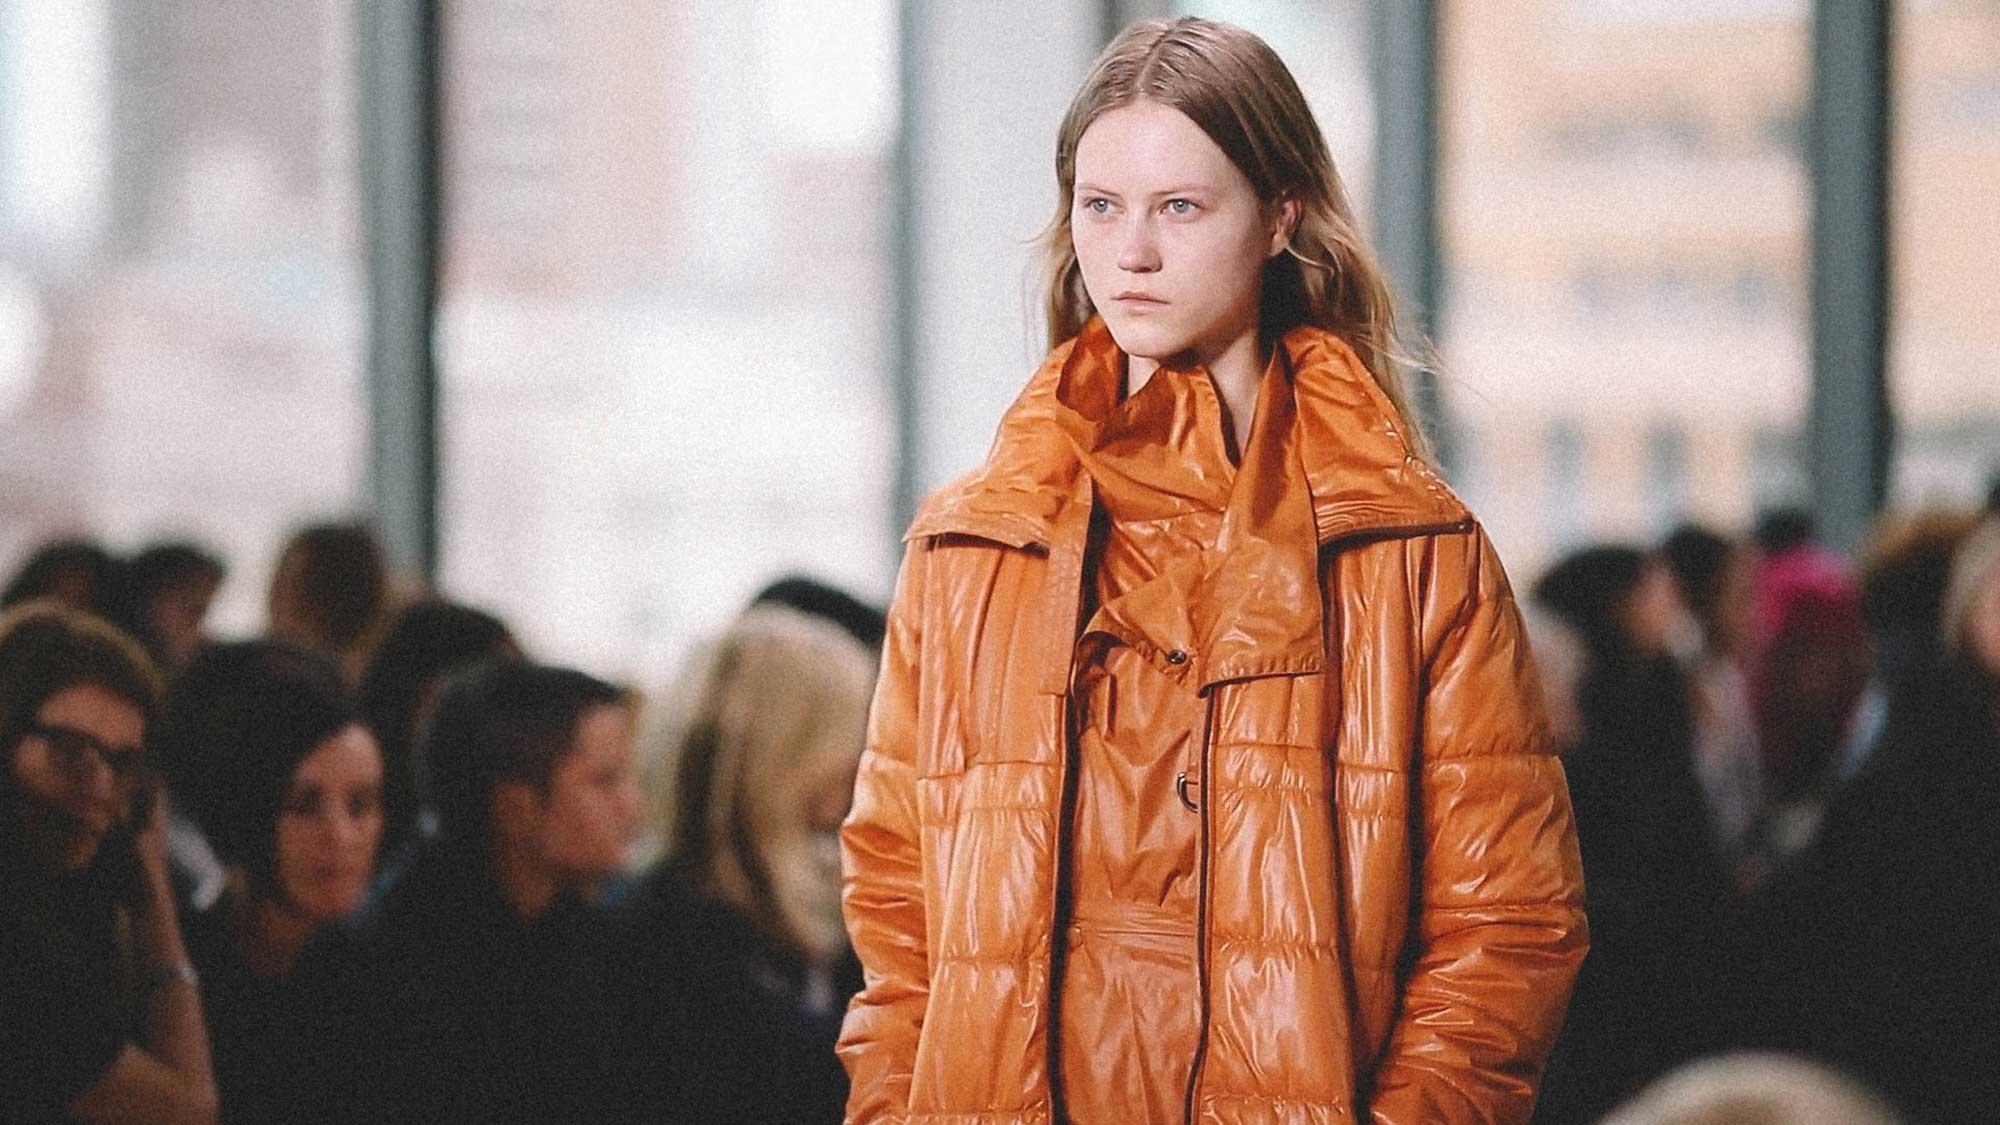 Lacoste-Runway-Show-New-York-Fashion-Week-5.jpg